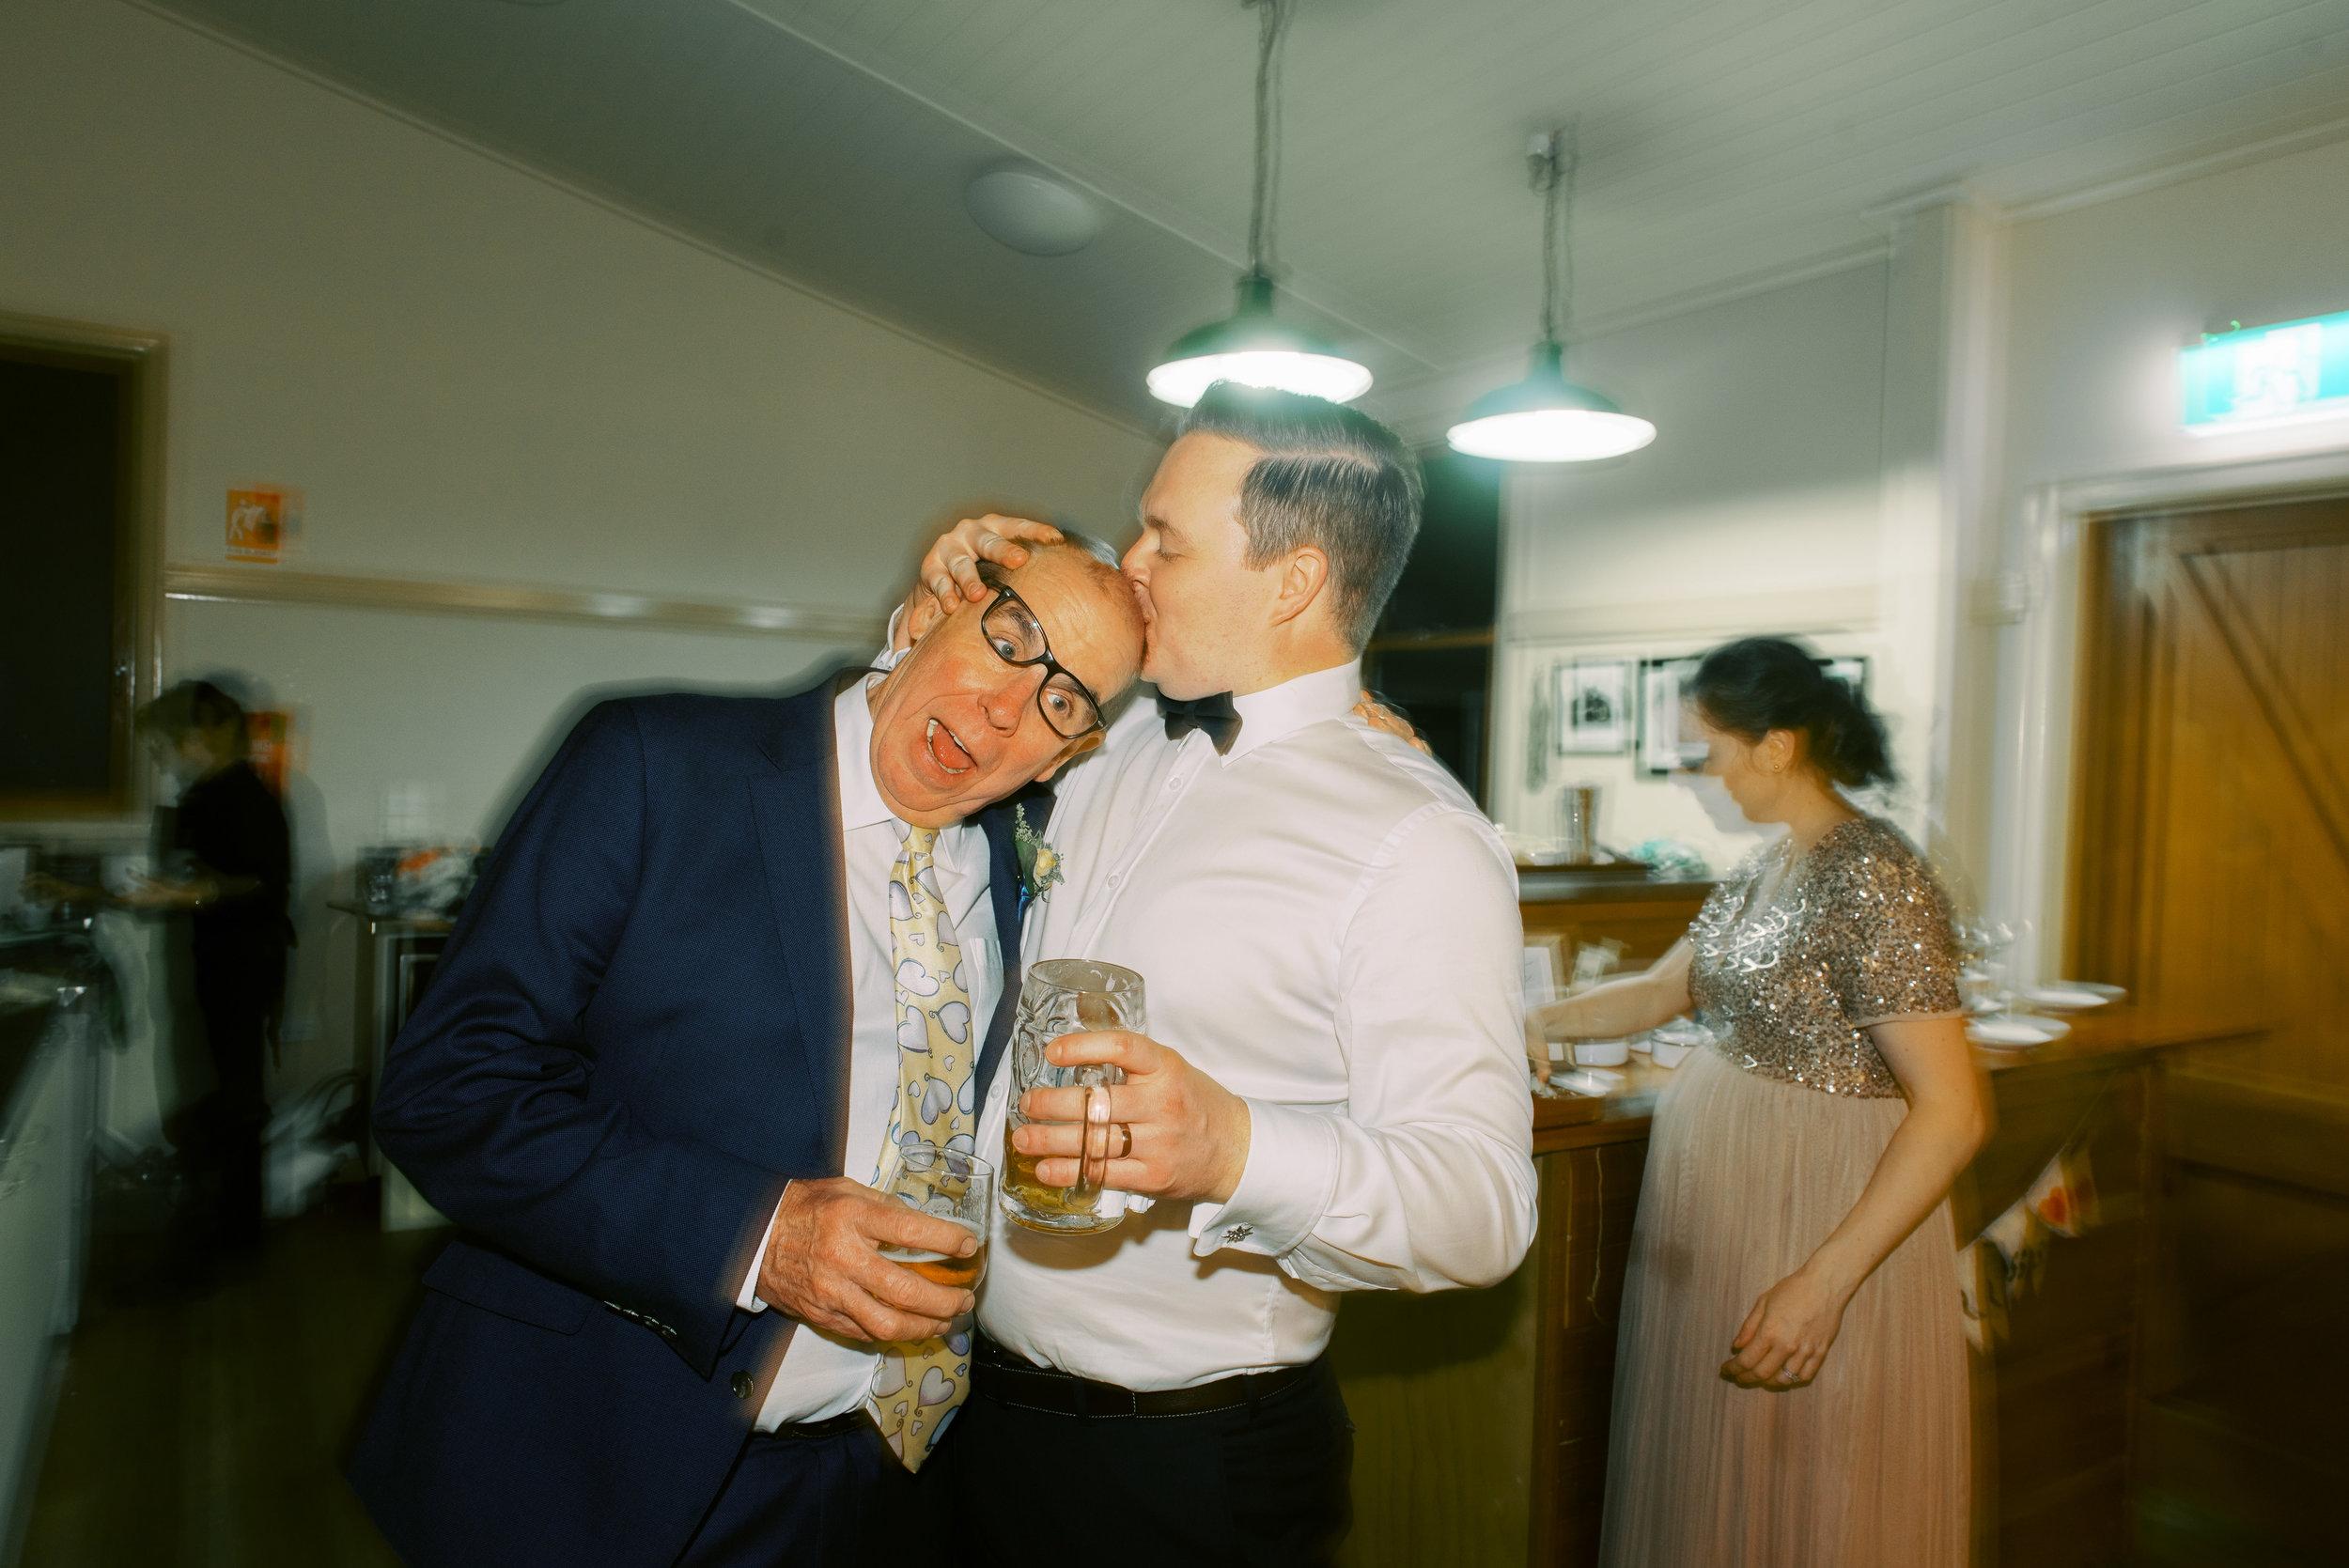 brisbane-gold-coast-sunshine-coast-tweed-romantic-fine-art-wedding-photography-lauren-olivia-99.jpg